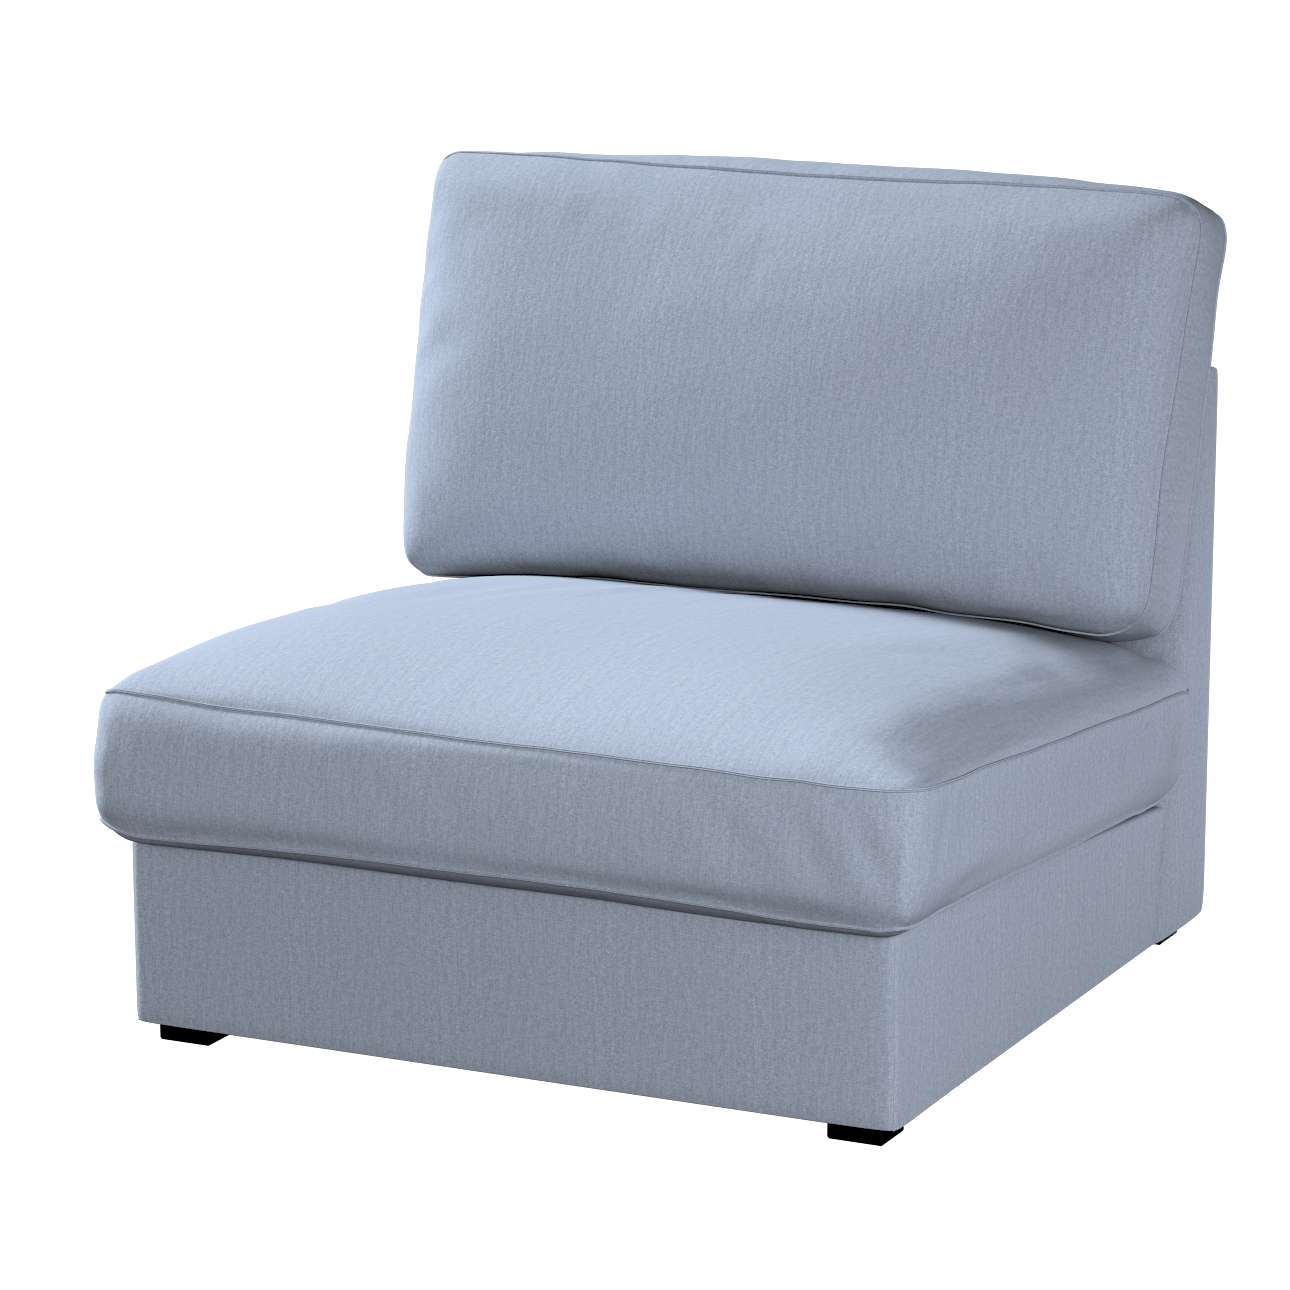 Pokrowiec na fotel Kivik Fotel Kivik w kolekcji Chenille, tkanina: 702-13